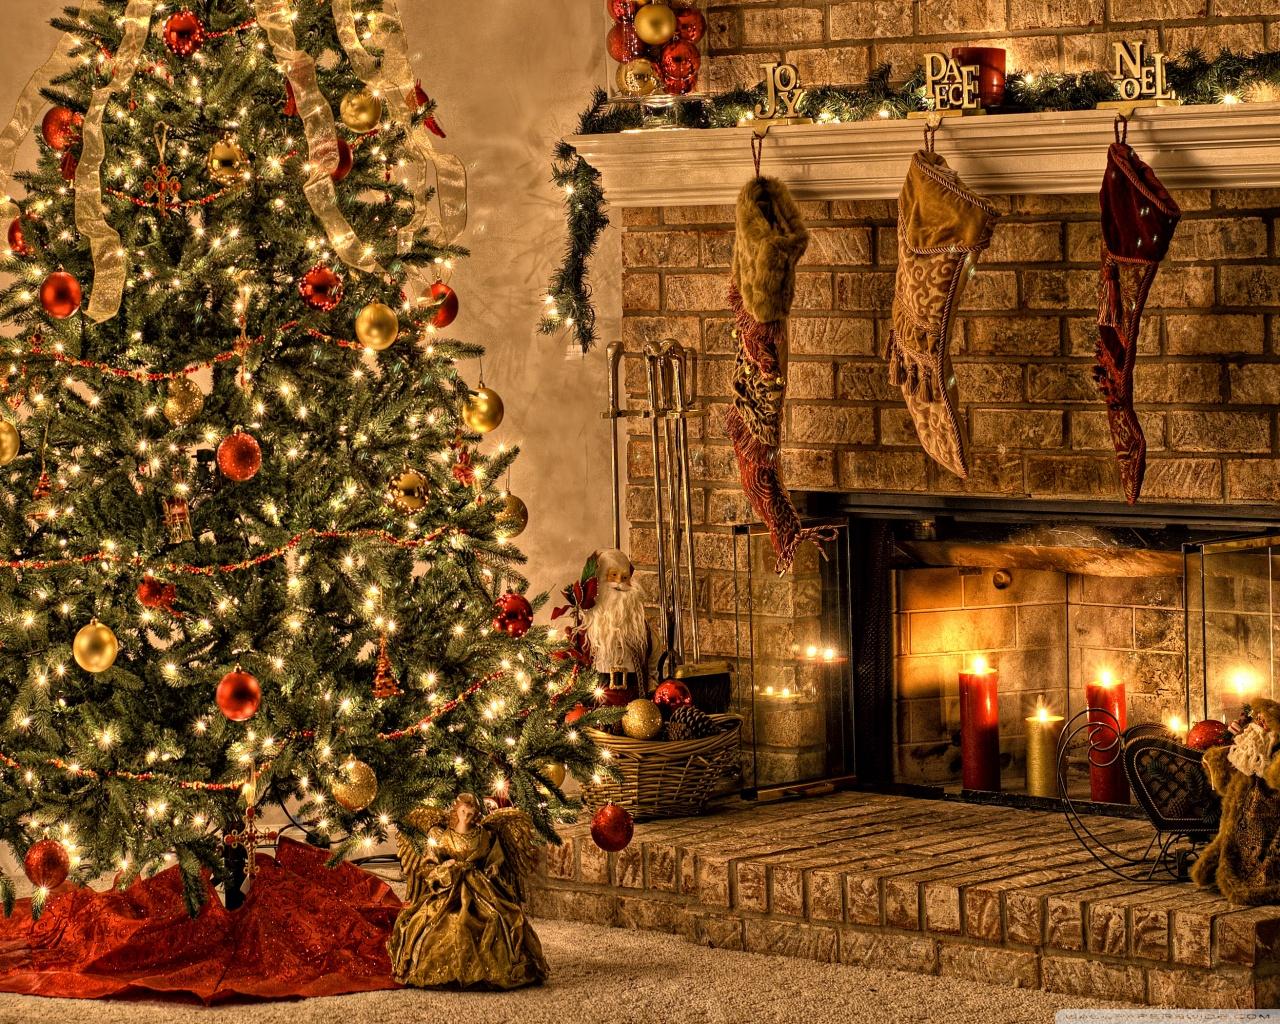 Christmas Night Wallpaper 1280x1024